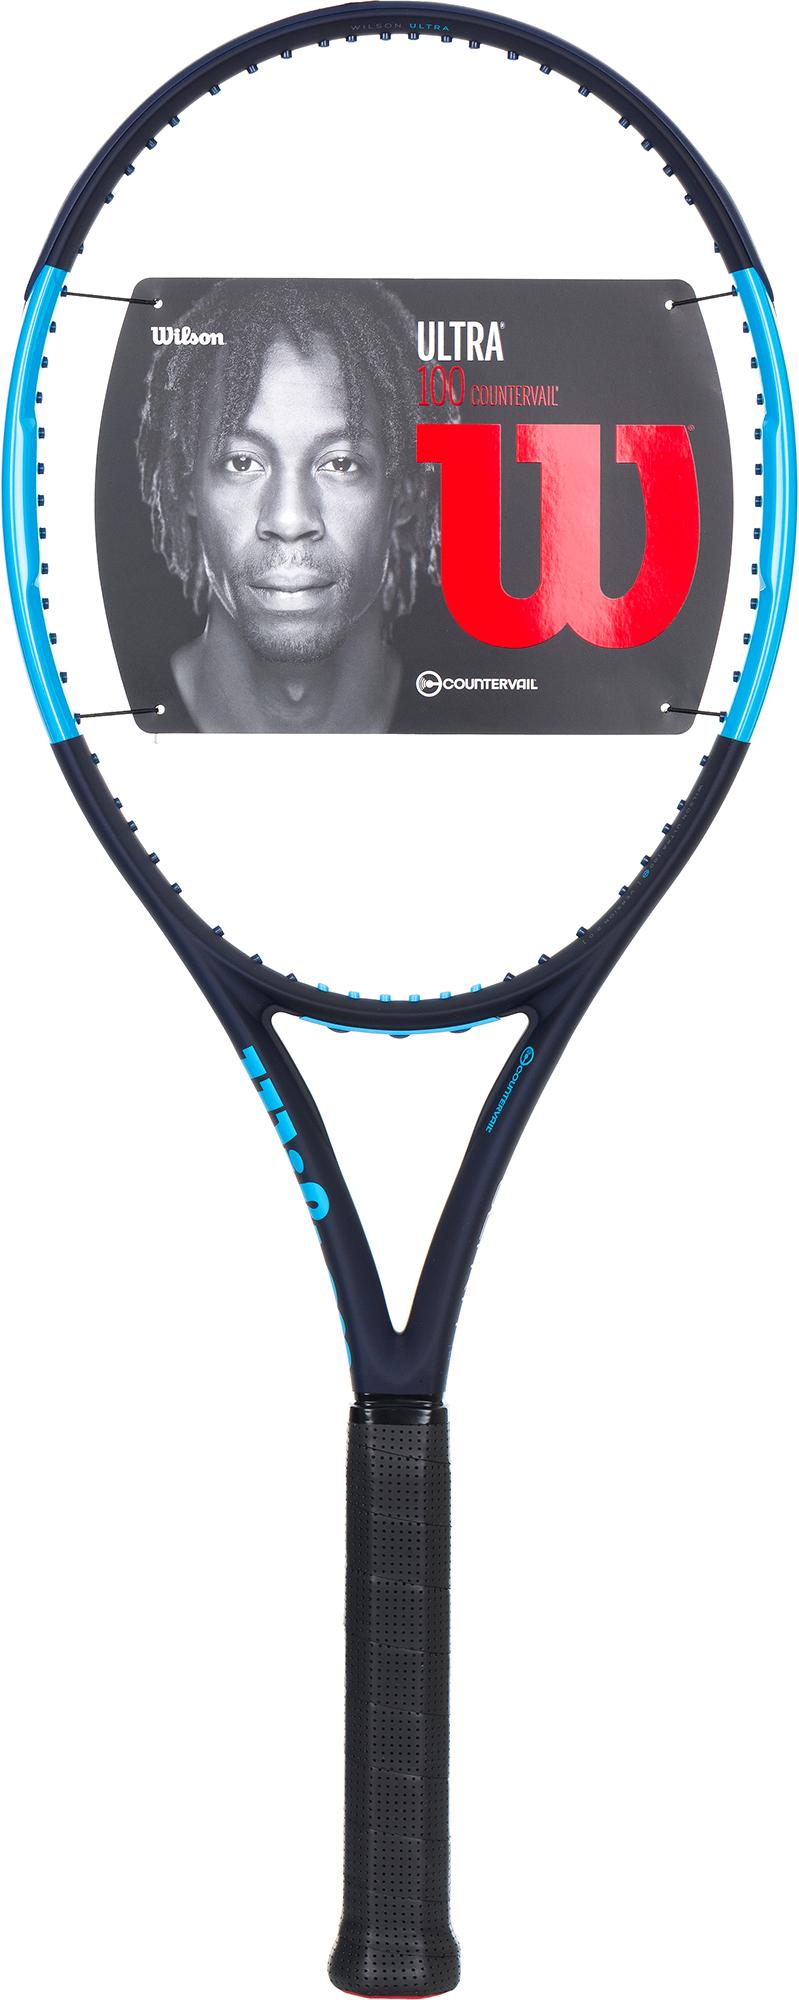 Wilson Ракетка для большого тенниса Wilson Ultra 100 CV, размер 4 wilson набор мячей для большого тенниса wilson us open x3 размер без размера